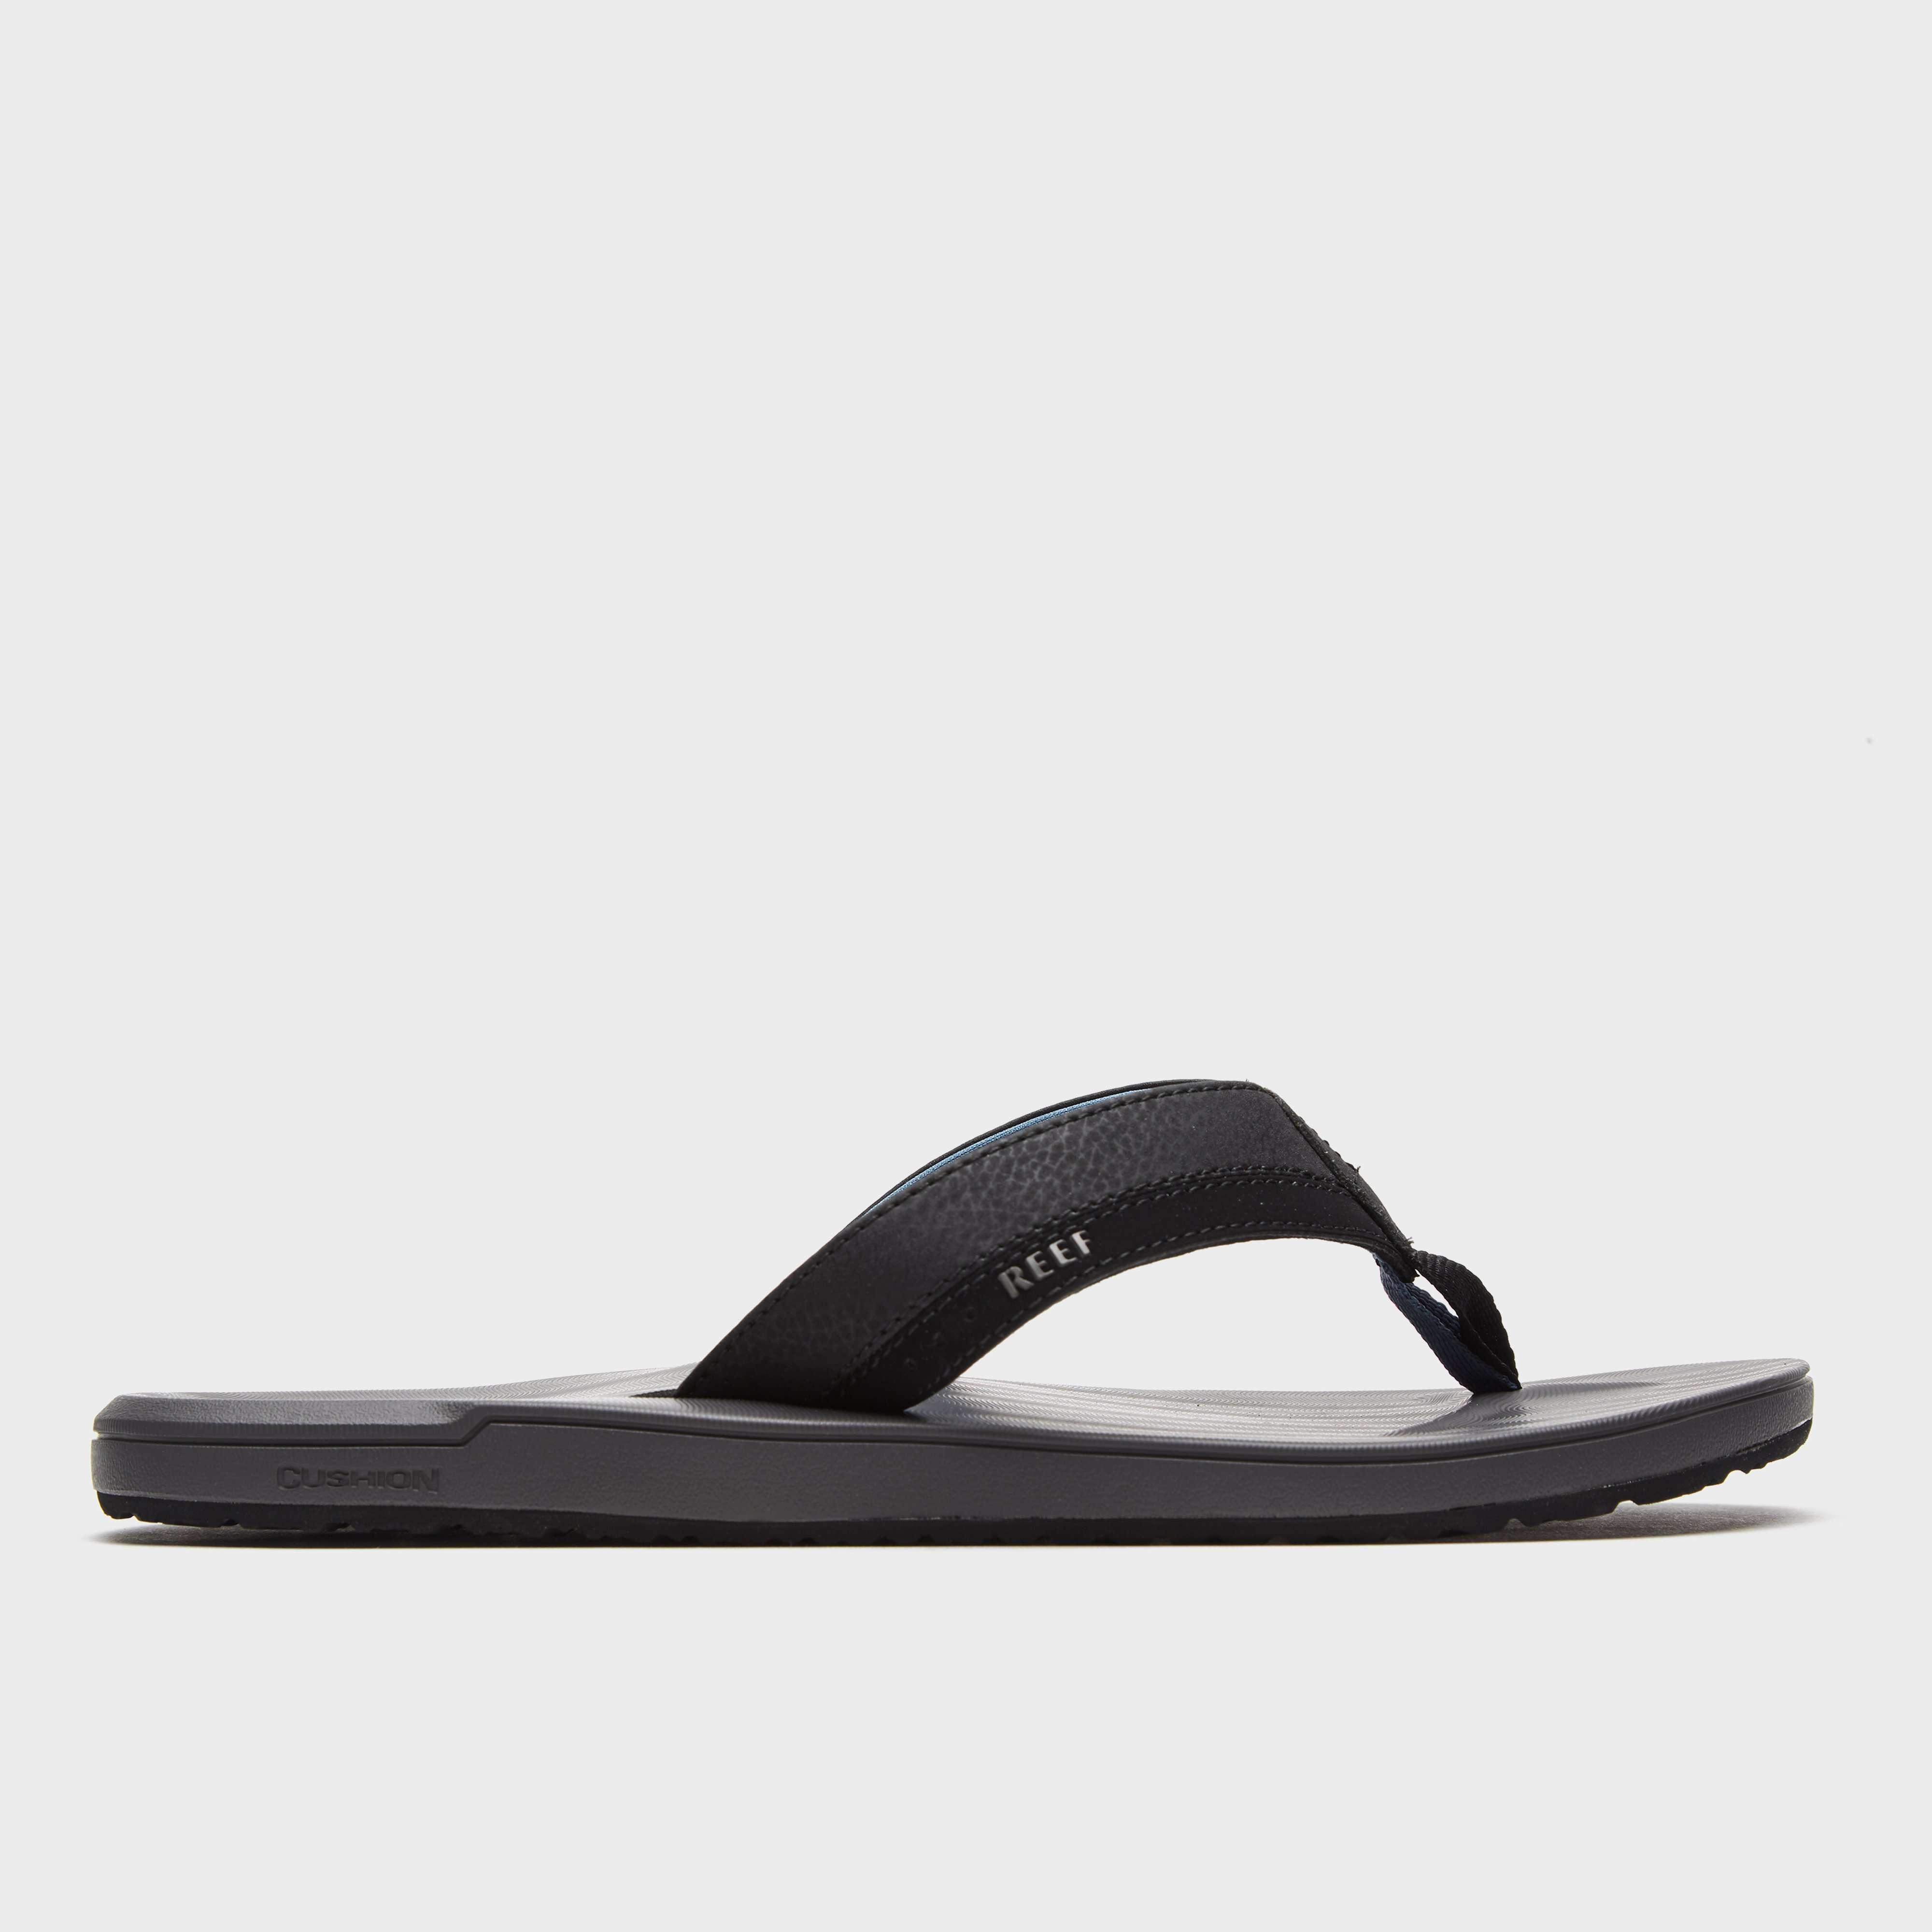 REEF Men's Contoured Cushion Sandals